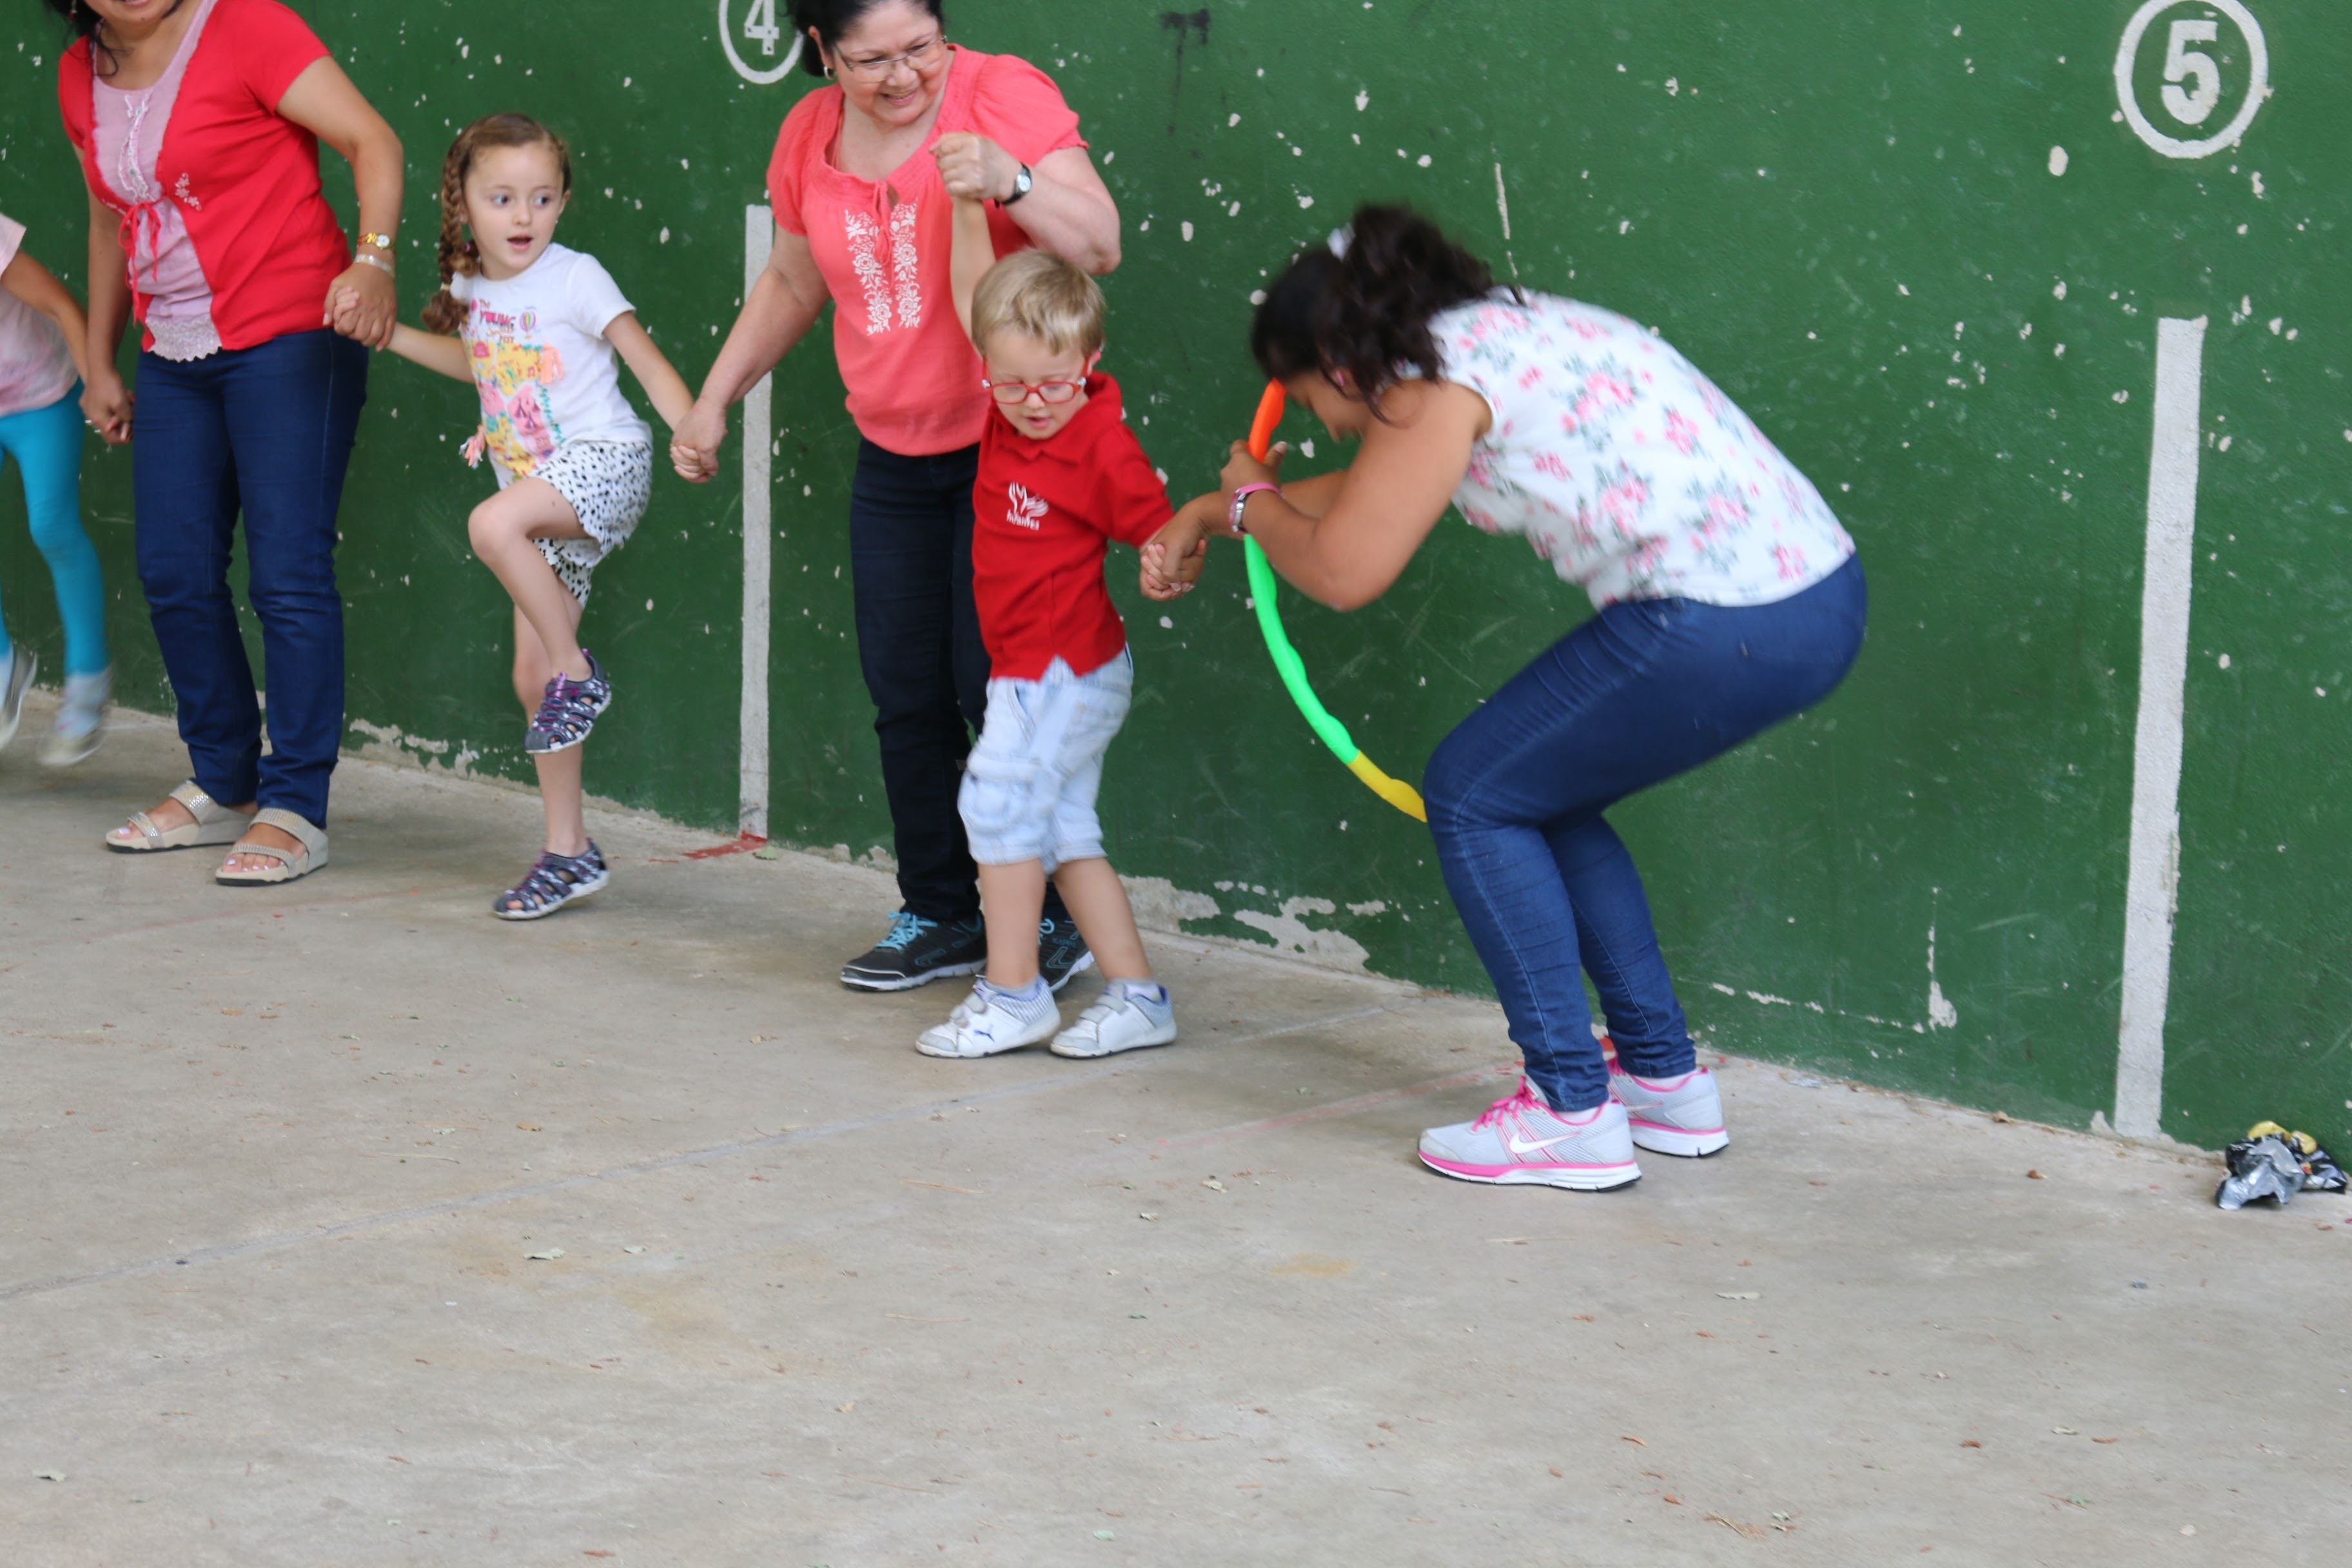 Picasa - Día de Campo SdJ 05.07.2015 (37).jpg